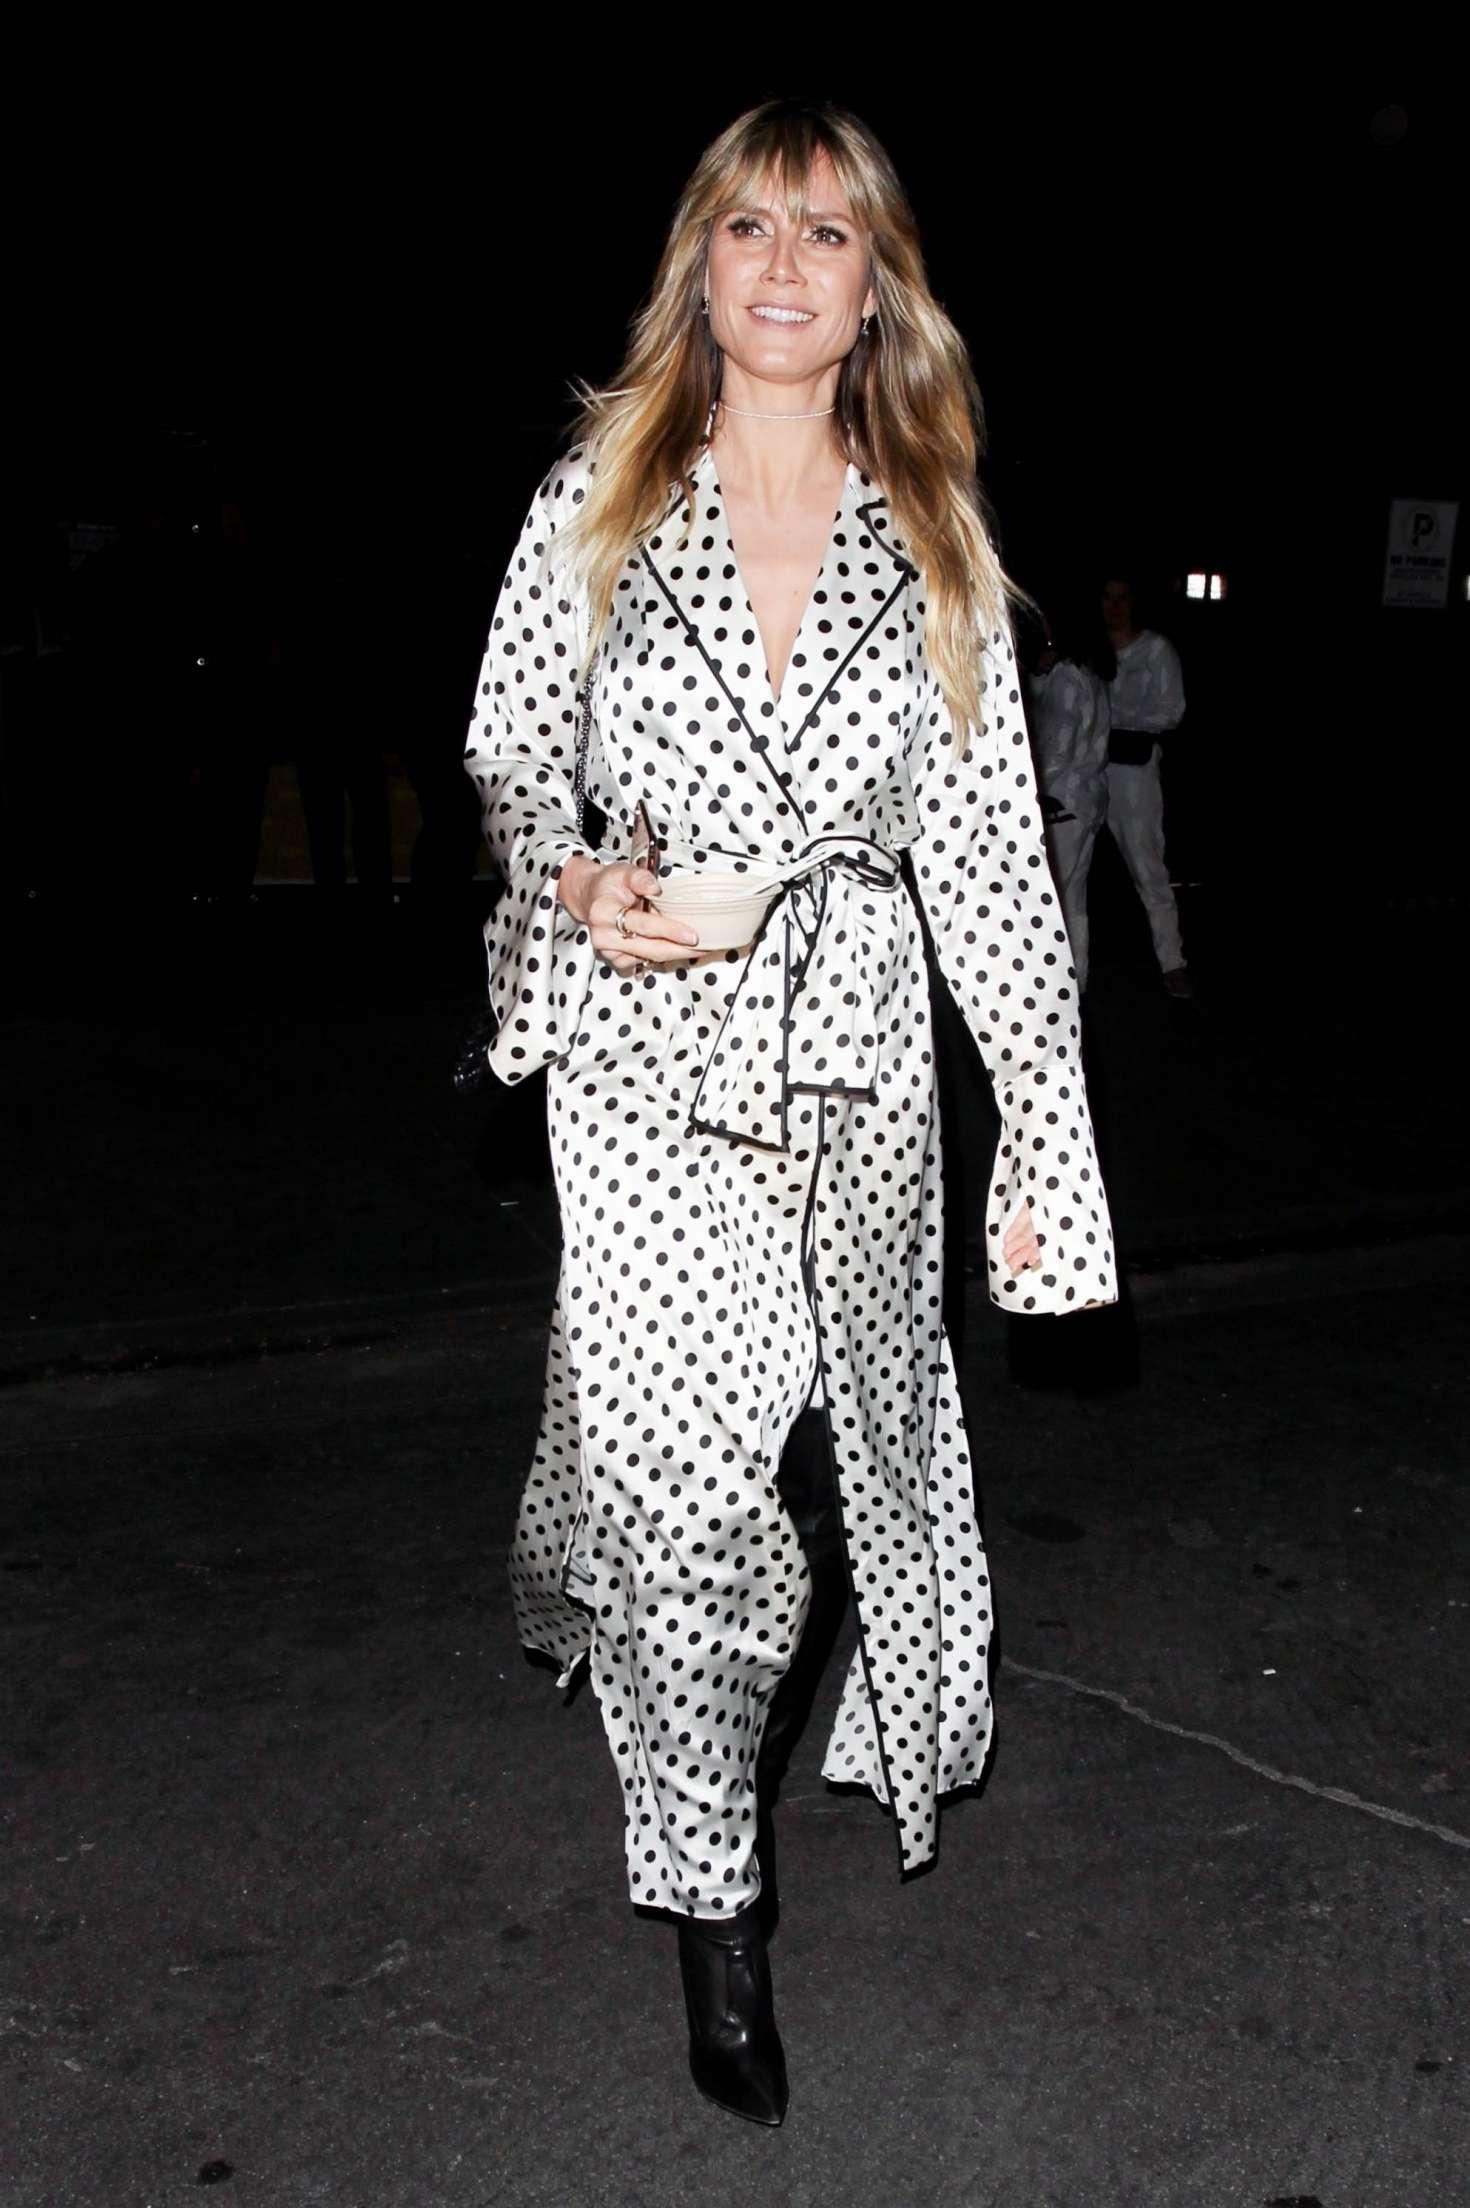 Heidi Klum 2019 : Heidi Klum: Leaves Billie Eilish Album Release Party -09